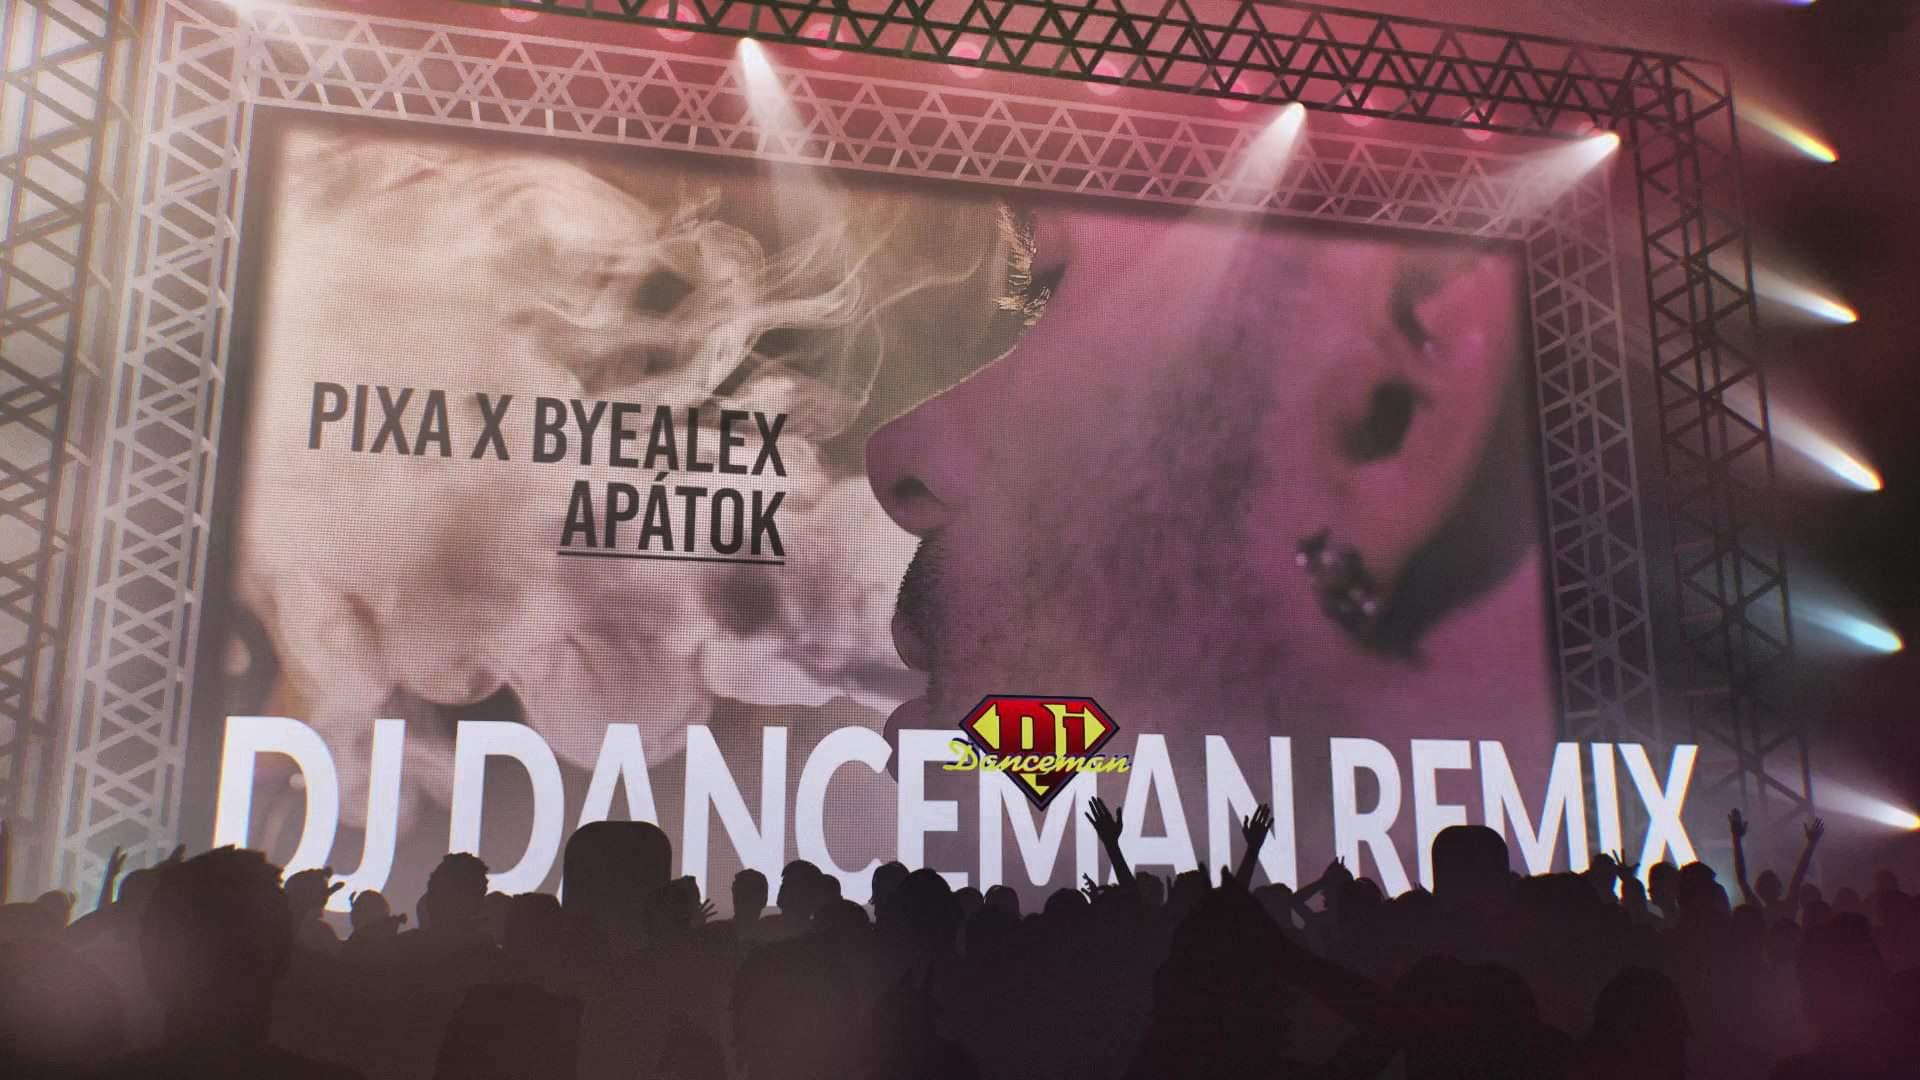 Pixa x ByAlex - Apátok (Dj Danceman Remix)